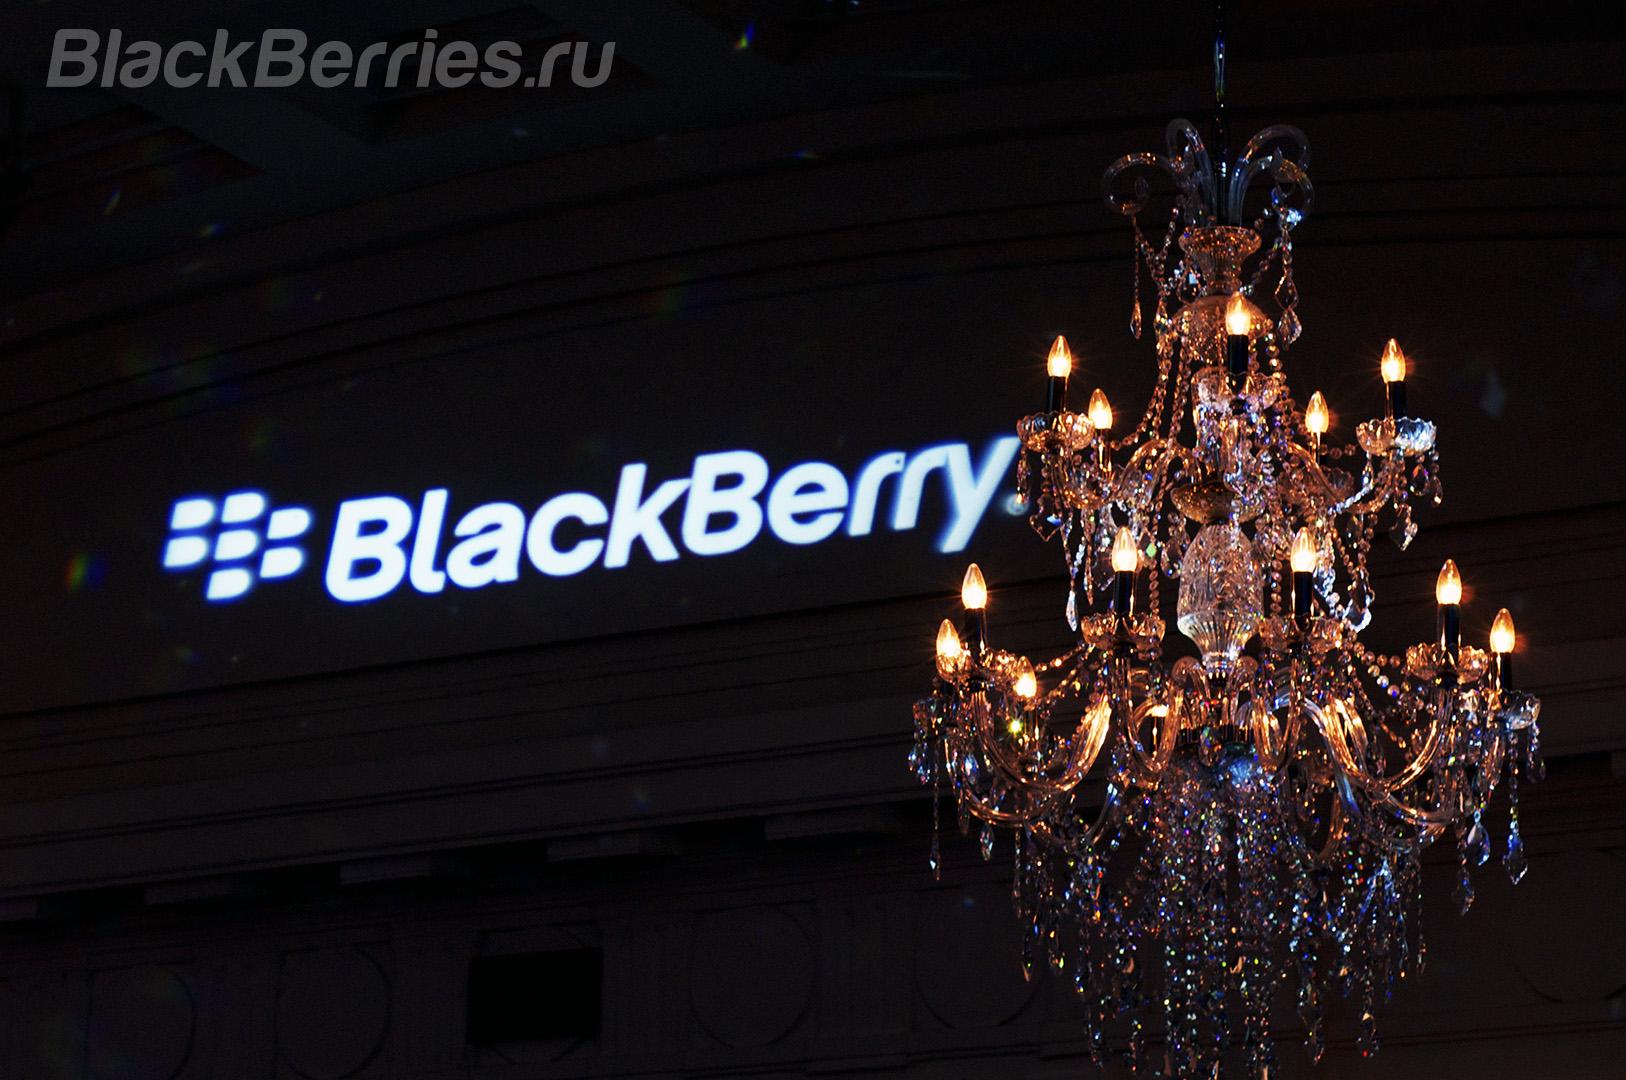 blackberry-q3-2017